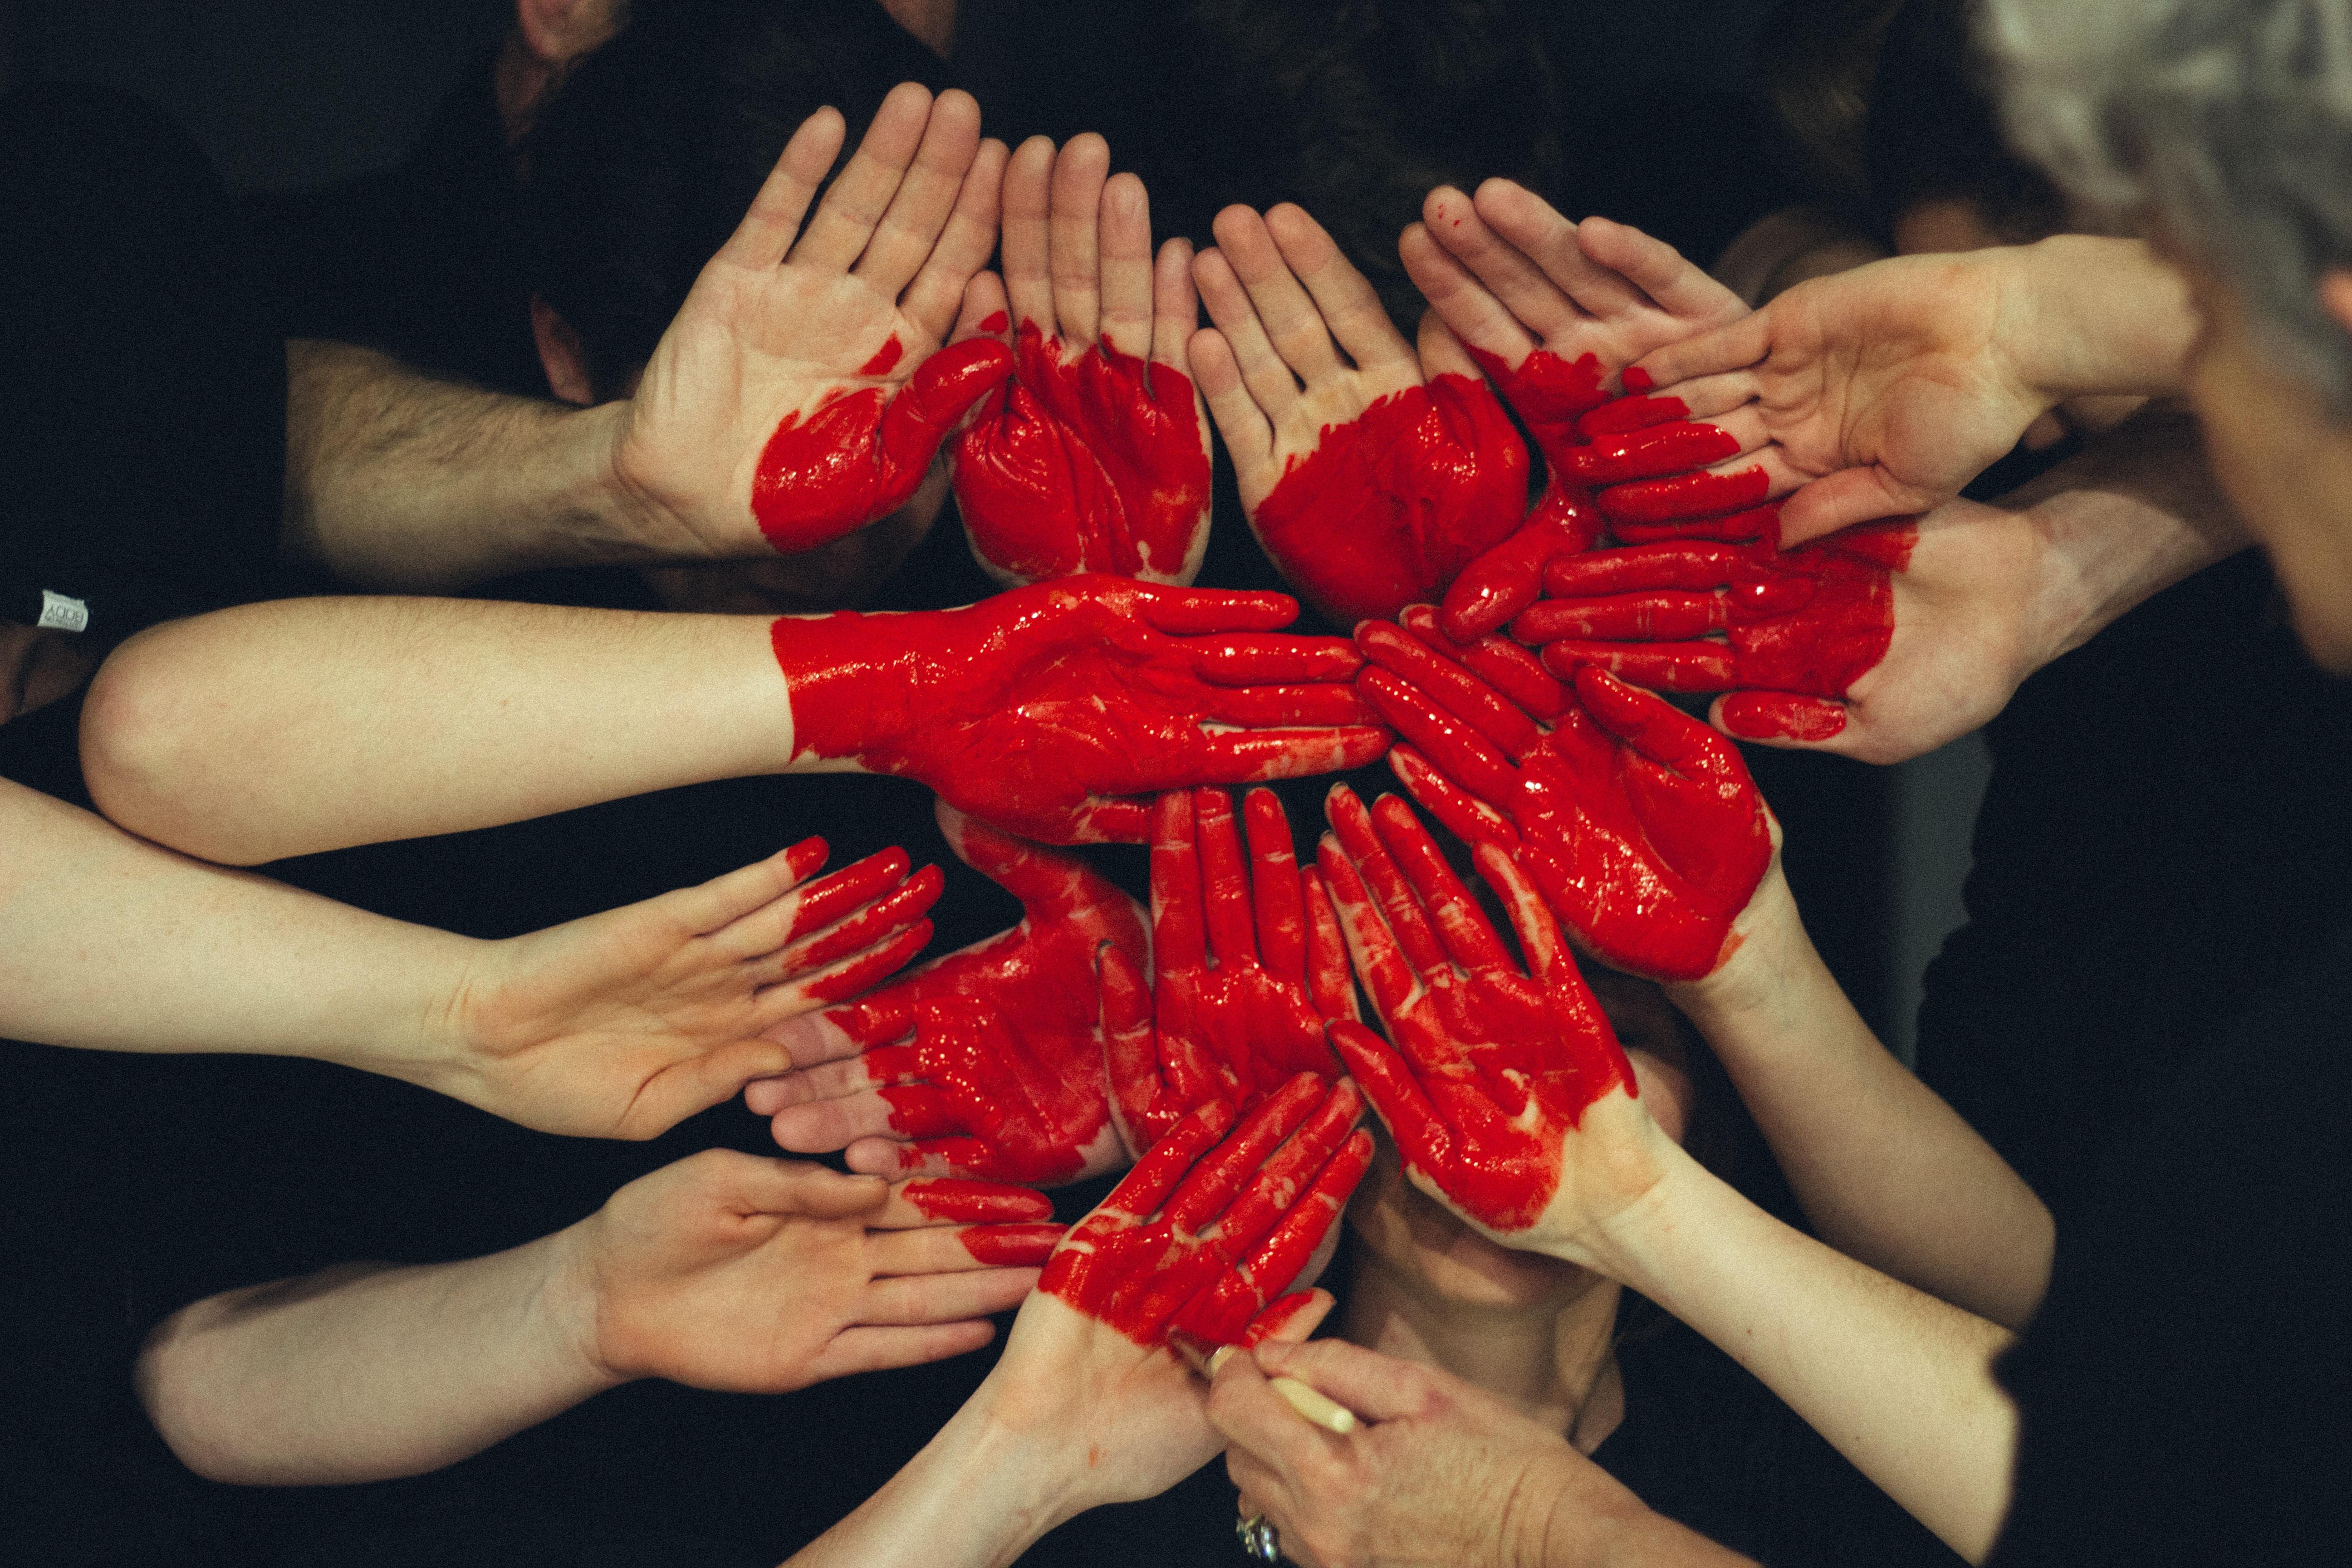 February: American Heart Month